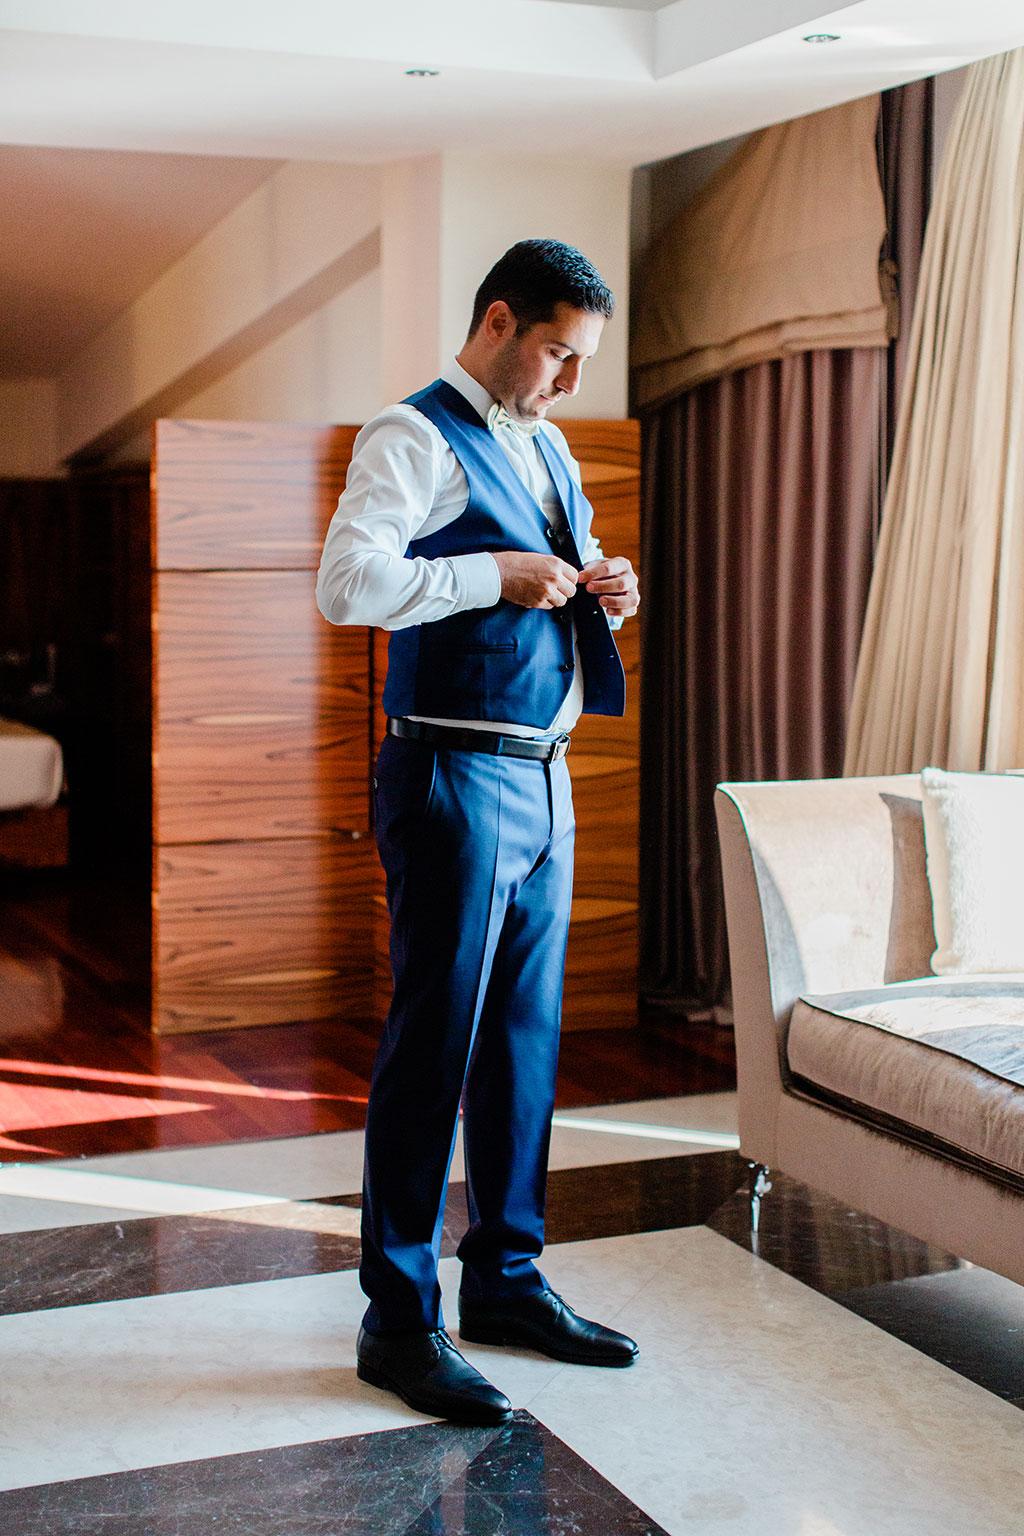 groom getting ready in a room of a hotel in thessaloniki, προετοιμασία γαμπρού στην Θεσσαλονίκη